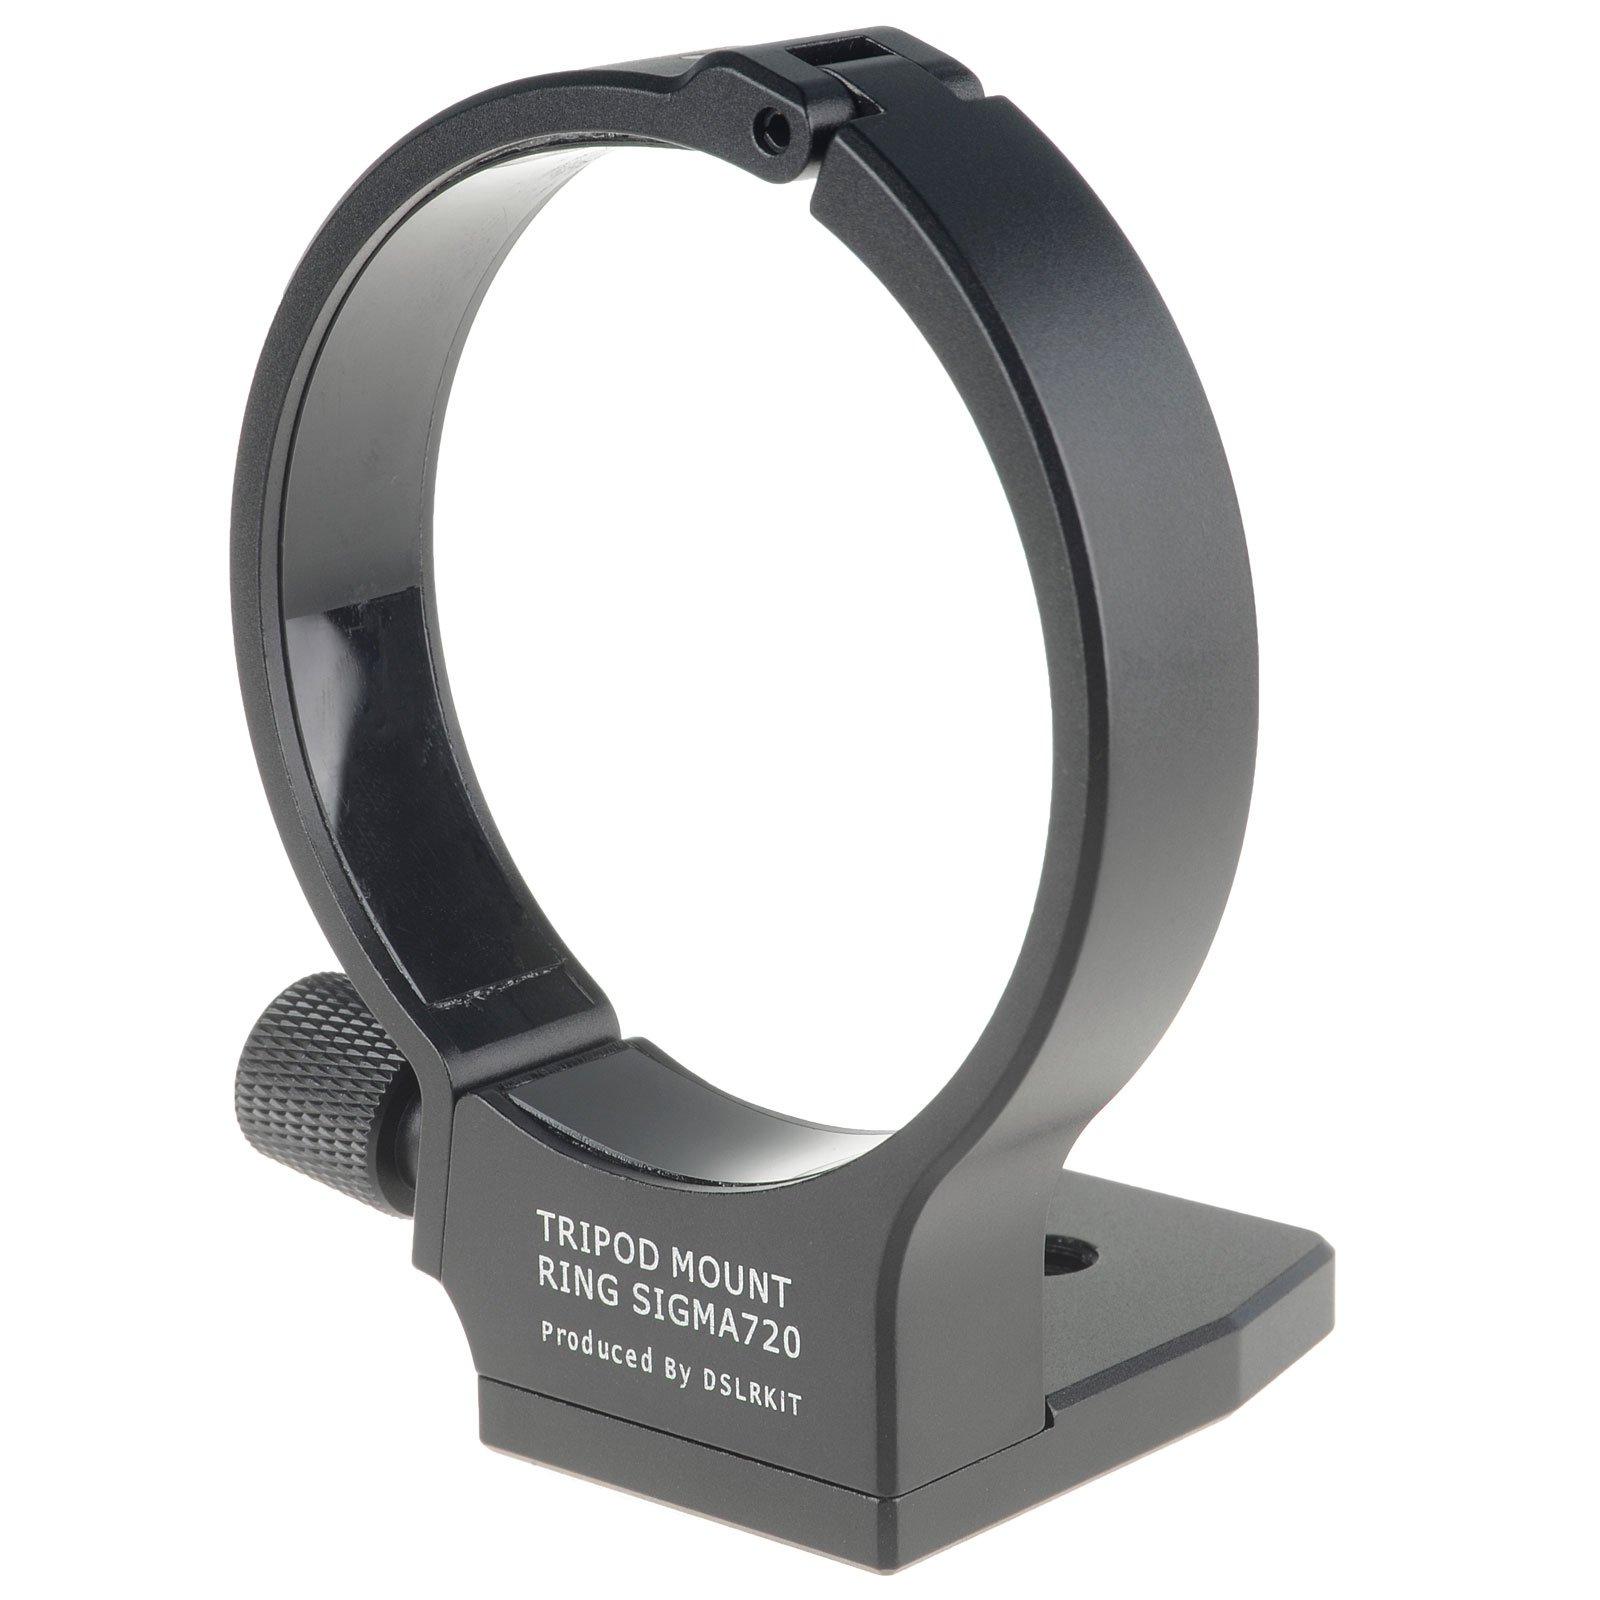 DSLRKIT Tripod Mount Ring for SIGMA APO 70-200mm F2.8 II EX DG MACRO HSM APO 70-200mm f/2.8 EX DG OS HSM by DSLRKIT